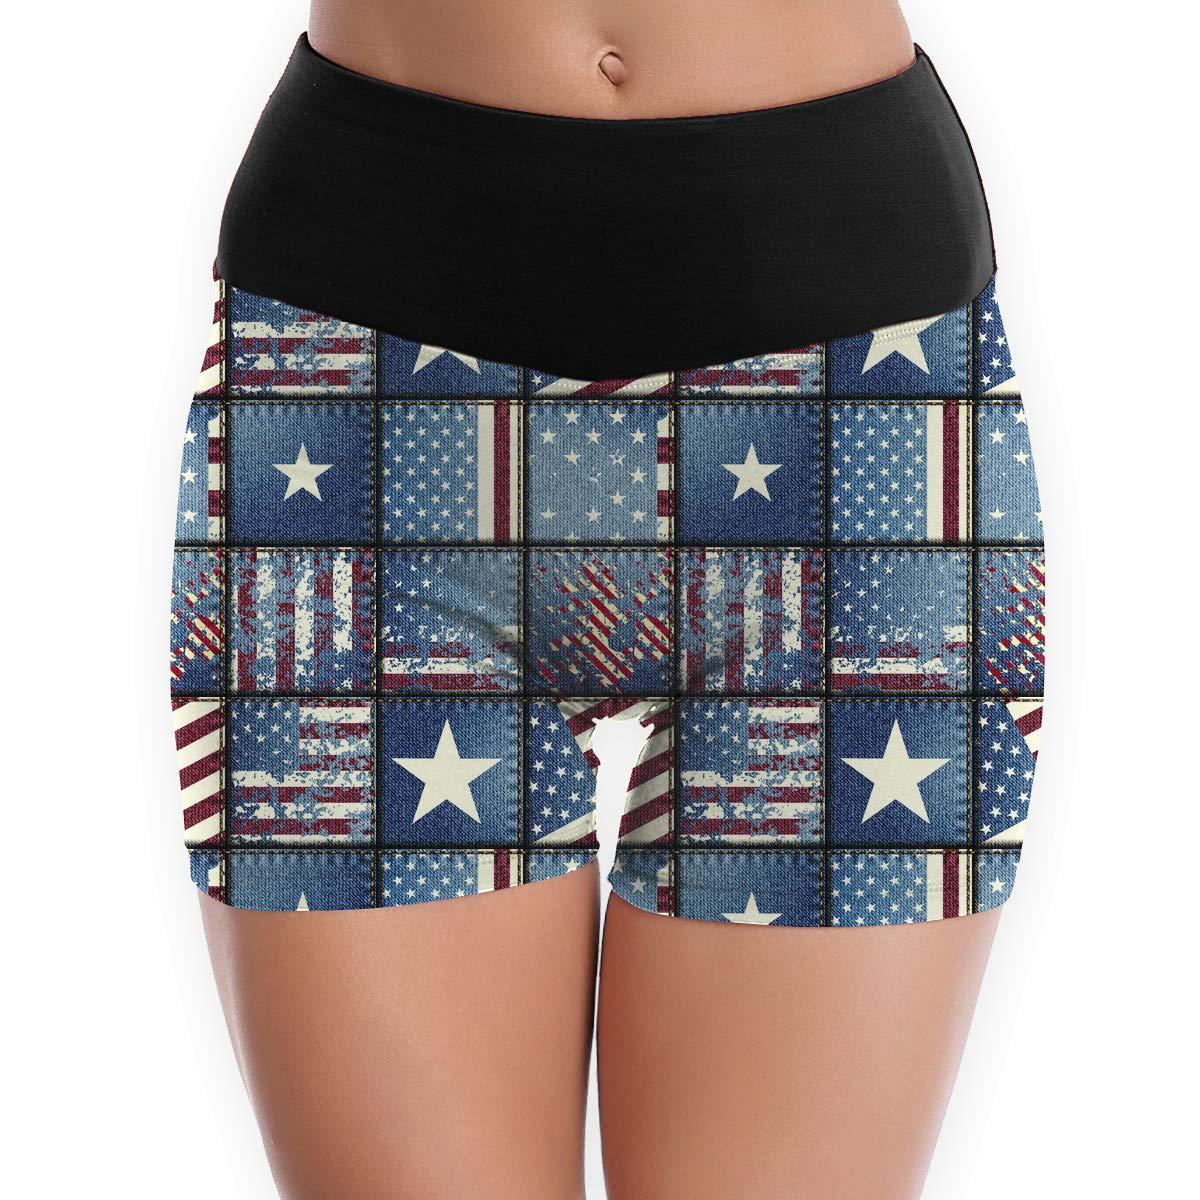 LDGT@DU Womens Yoga Shorts USA Flags Pattern Athletic Training Shorts